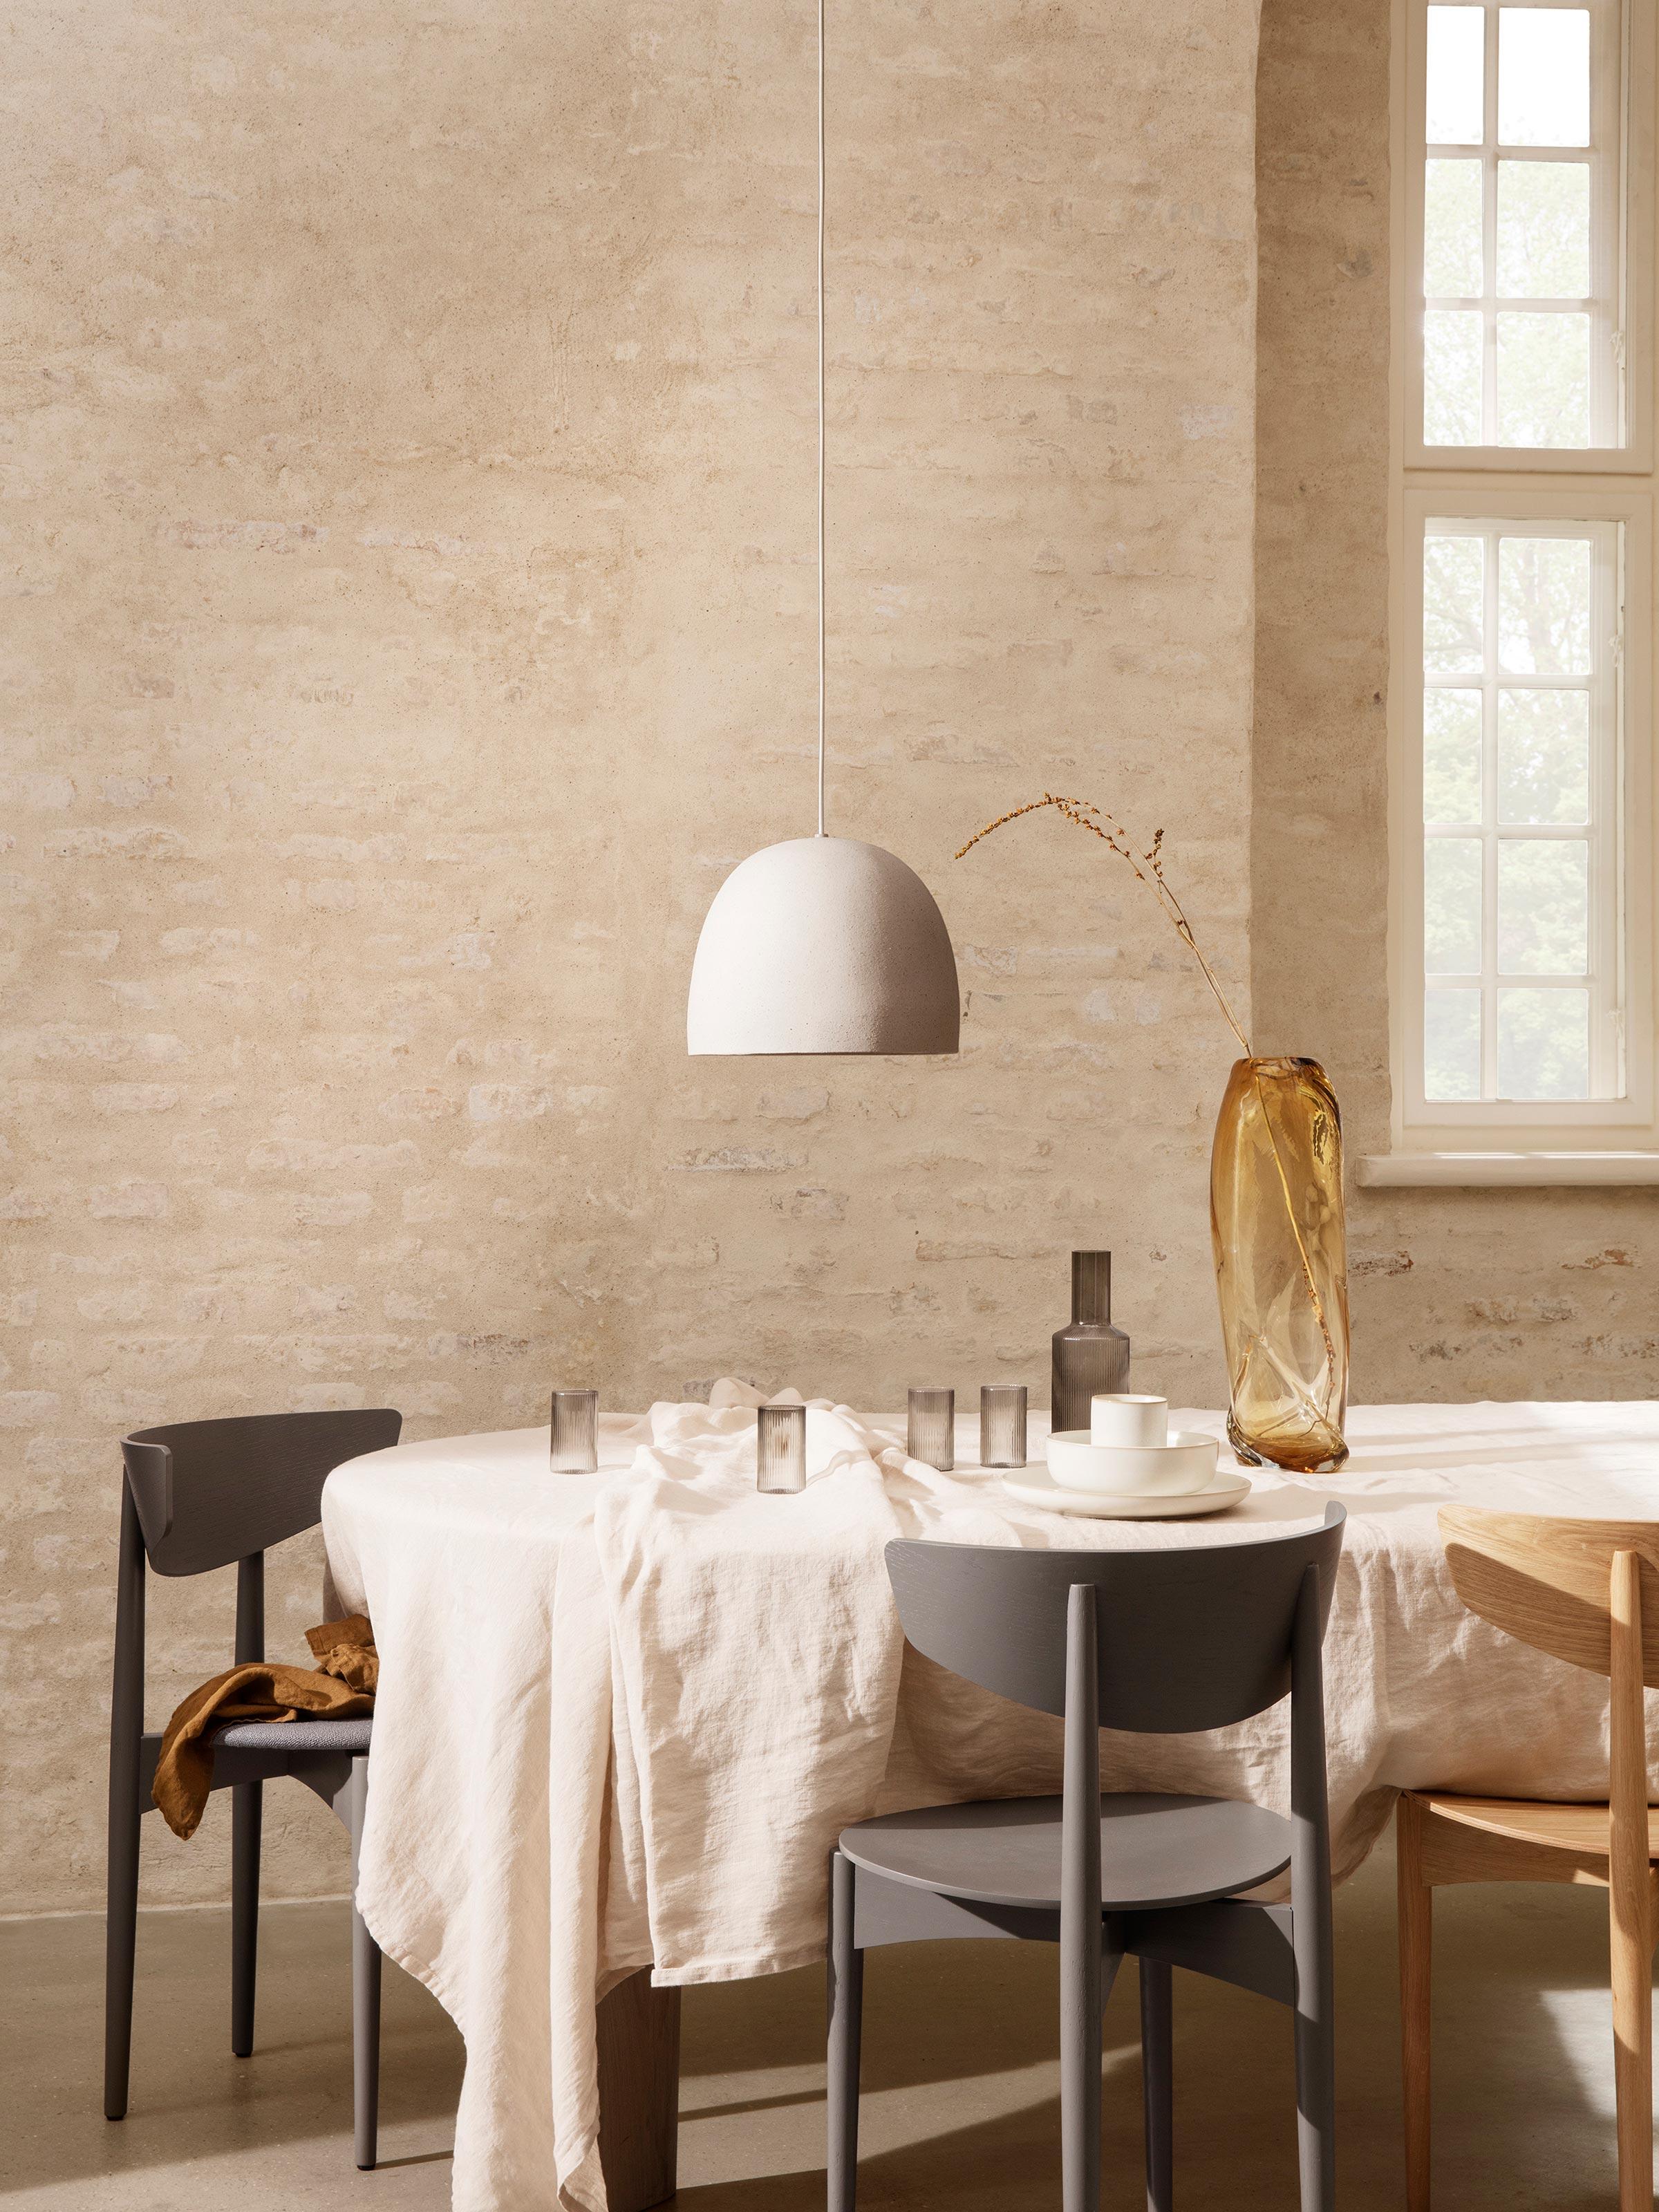 ferm Living - Best Nordic Design Brands